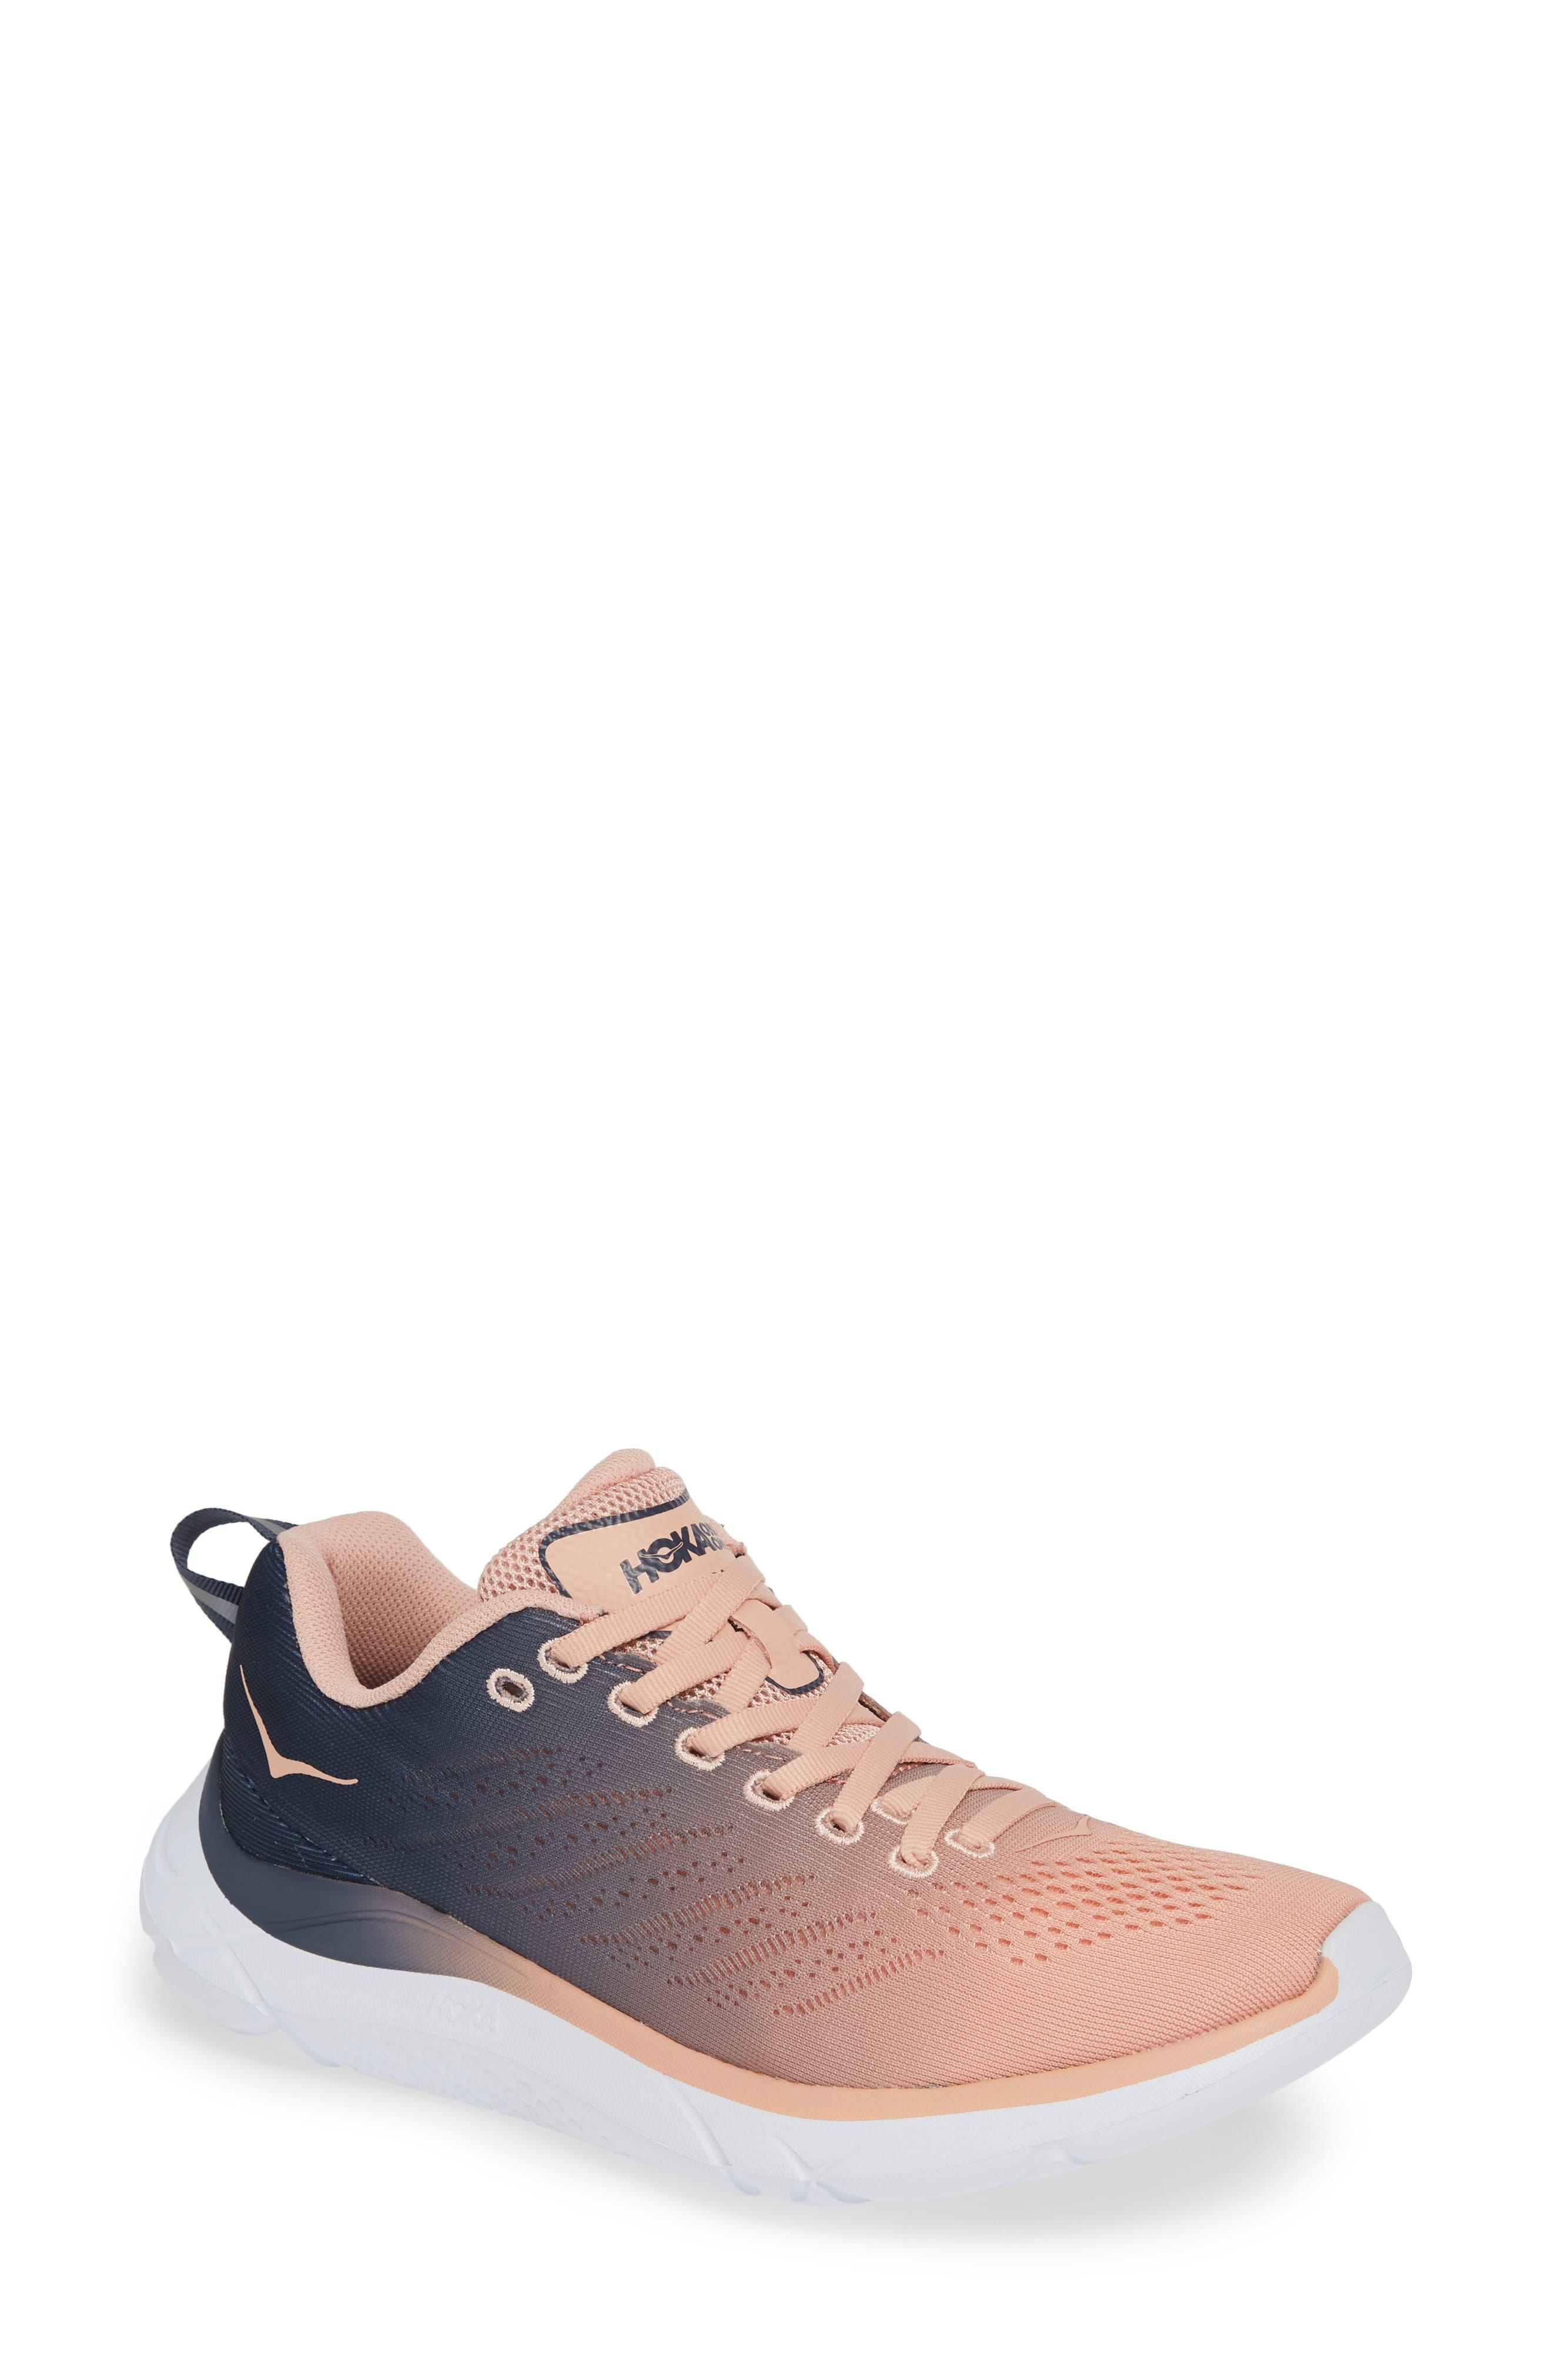 Hoka One One Hupana Em Sneaker, Pink